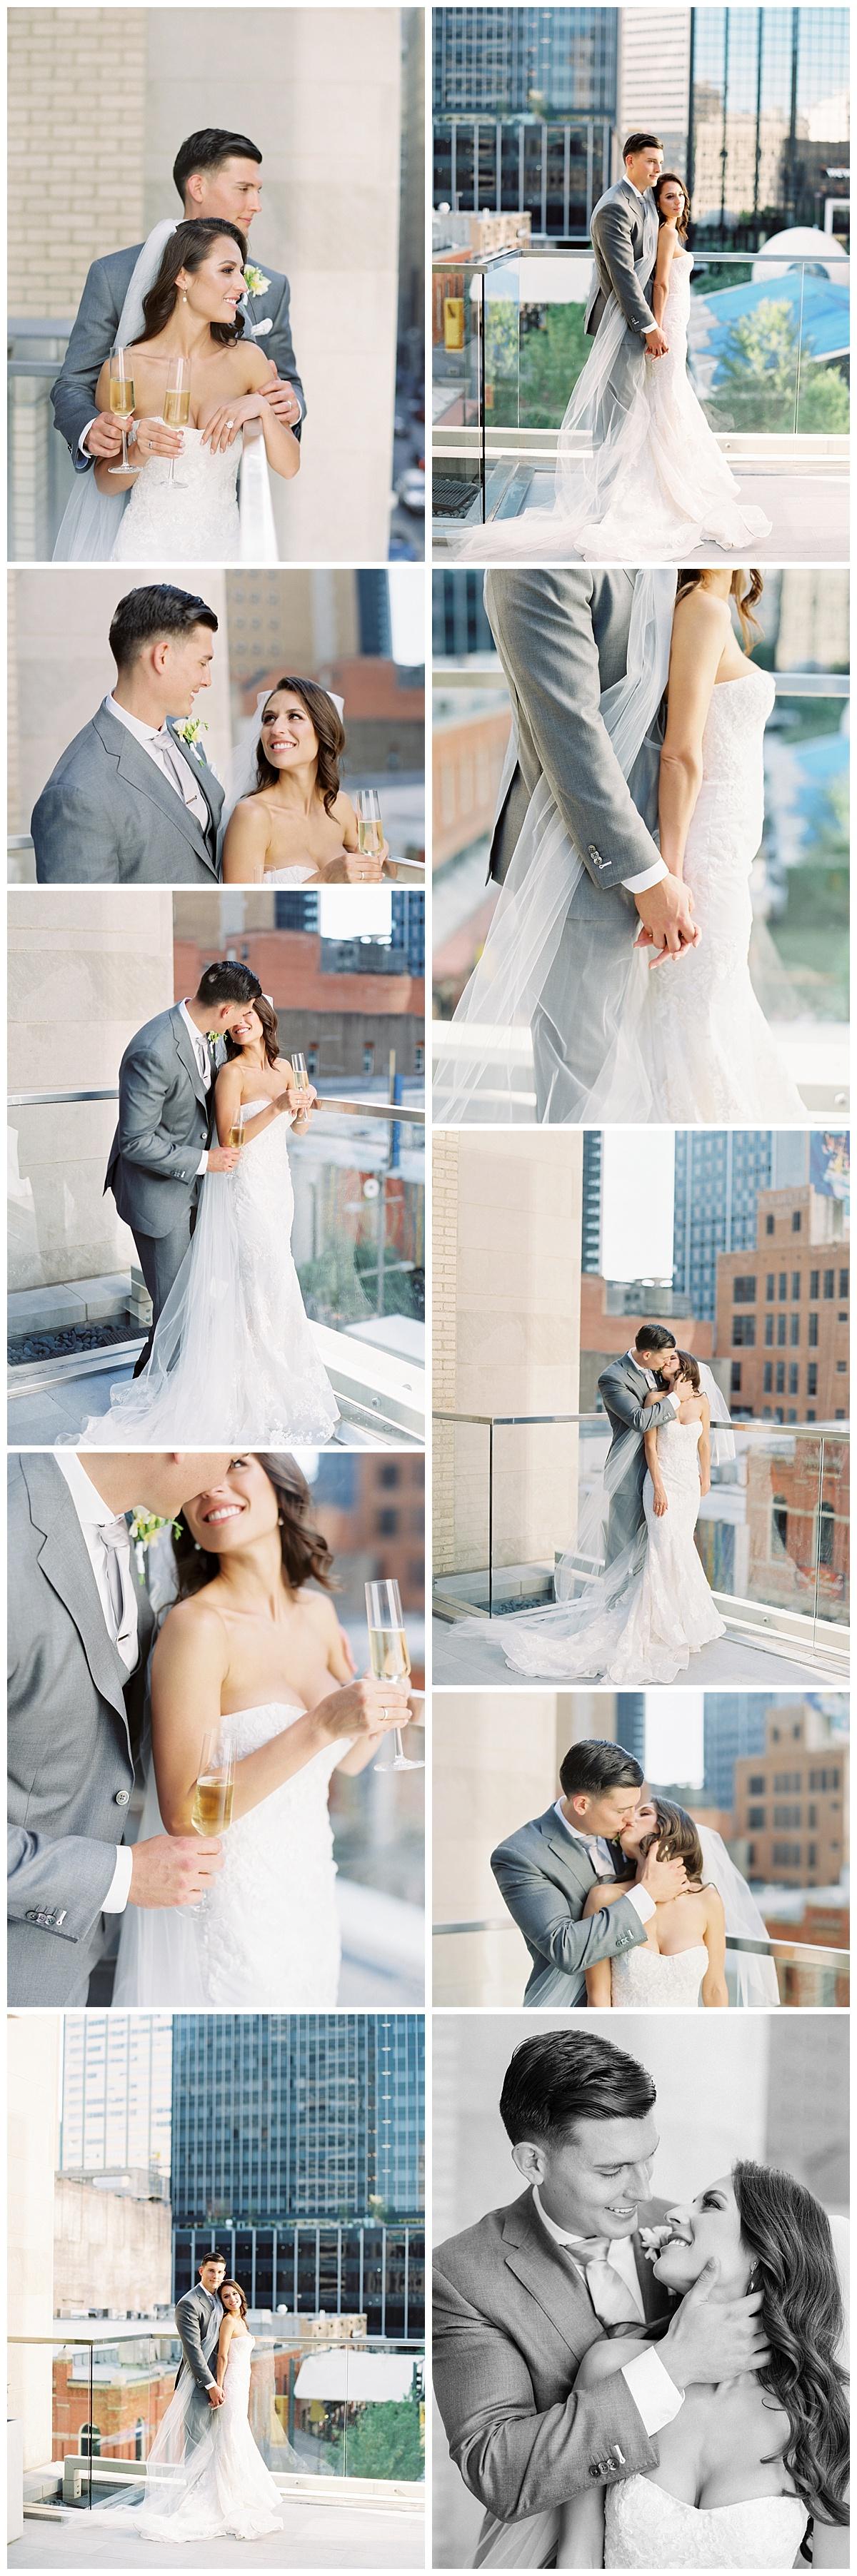 the-joule-dallas-wedding-ar-photography-6.jpg